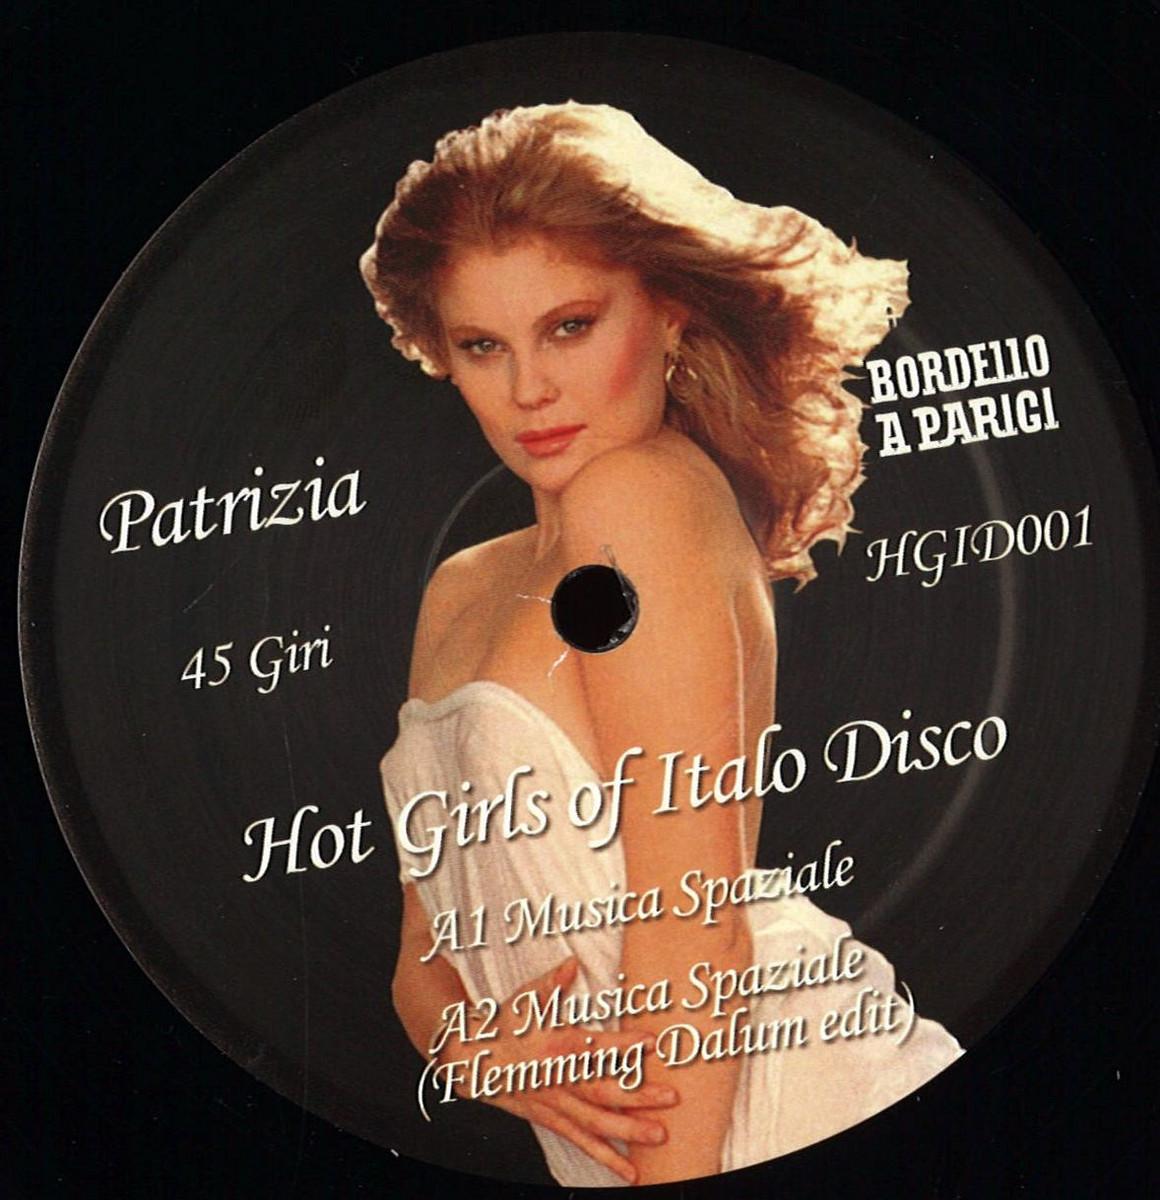 Various - Hot Girls Of Italo Disco / Bordello A Parigi HGID001RE - Vinyl